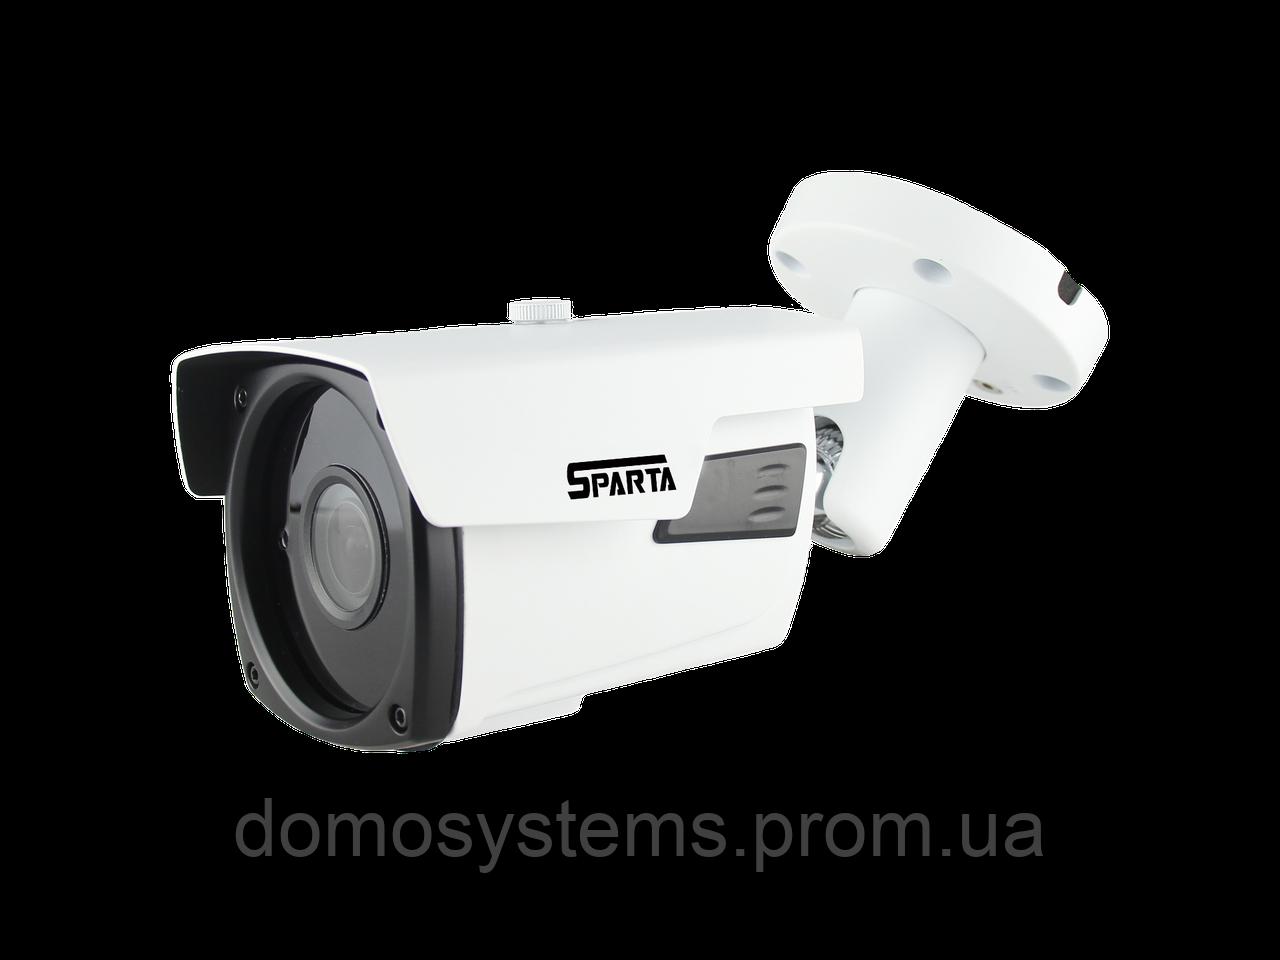 IP-камера 3Мп Sparta SWPE30V3SR40 2.8-12мм